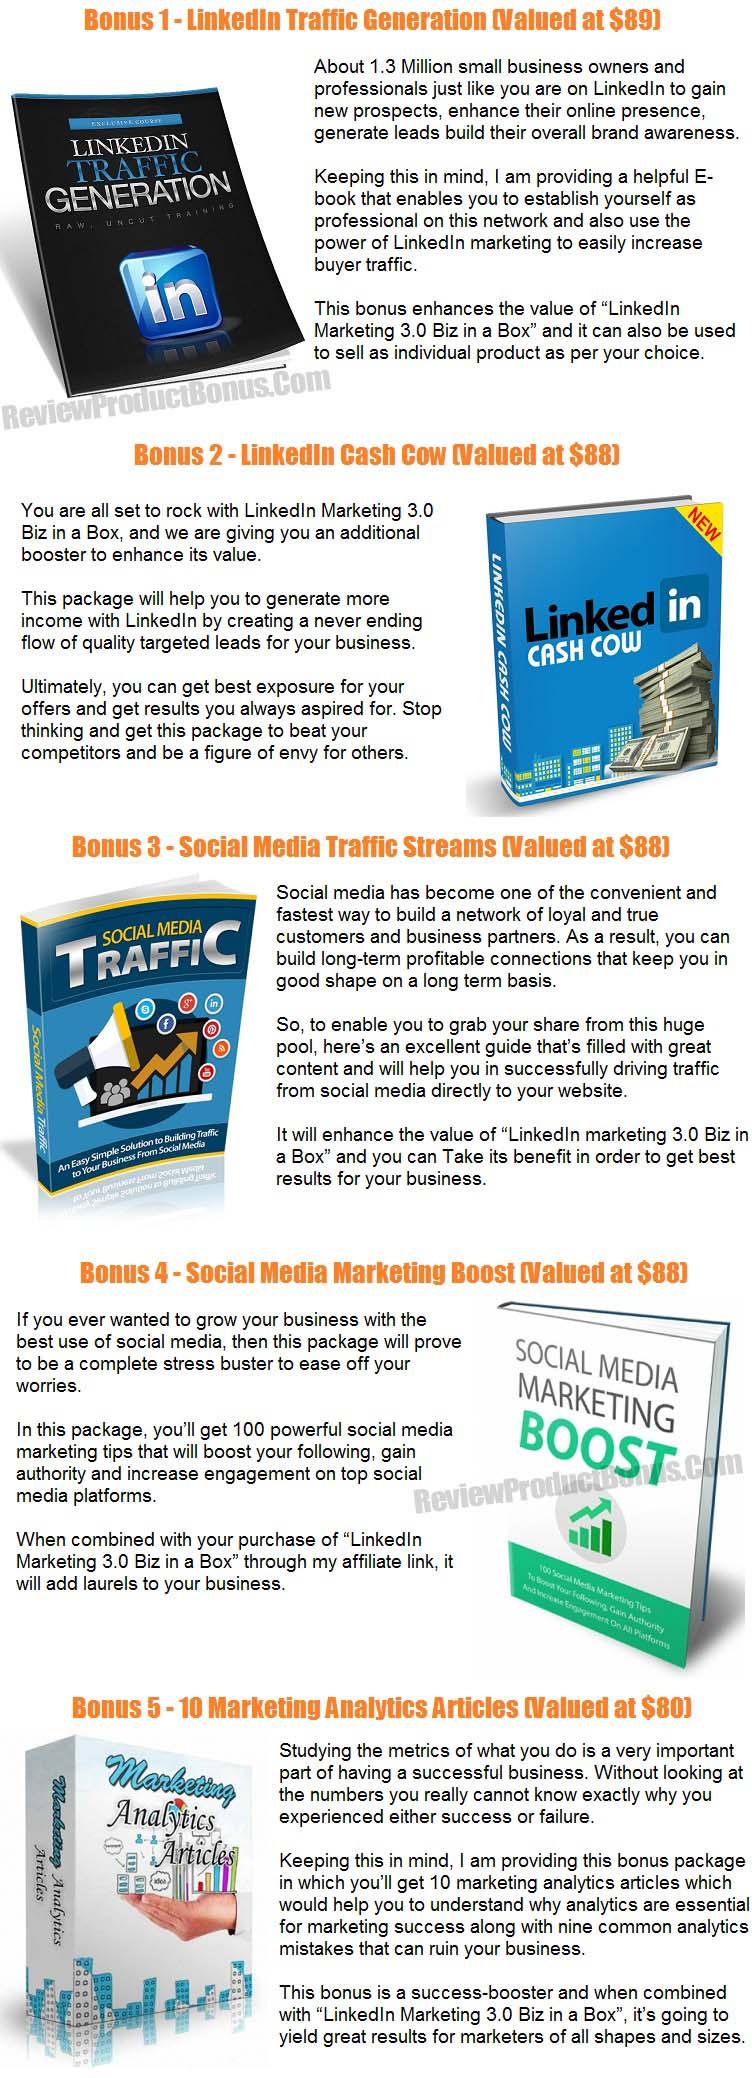 LinkedIn Marketing 3.0 Bonus